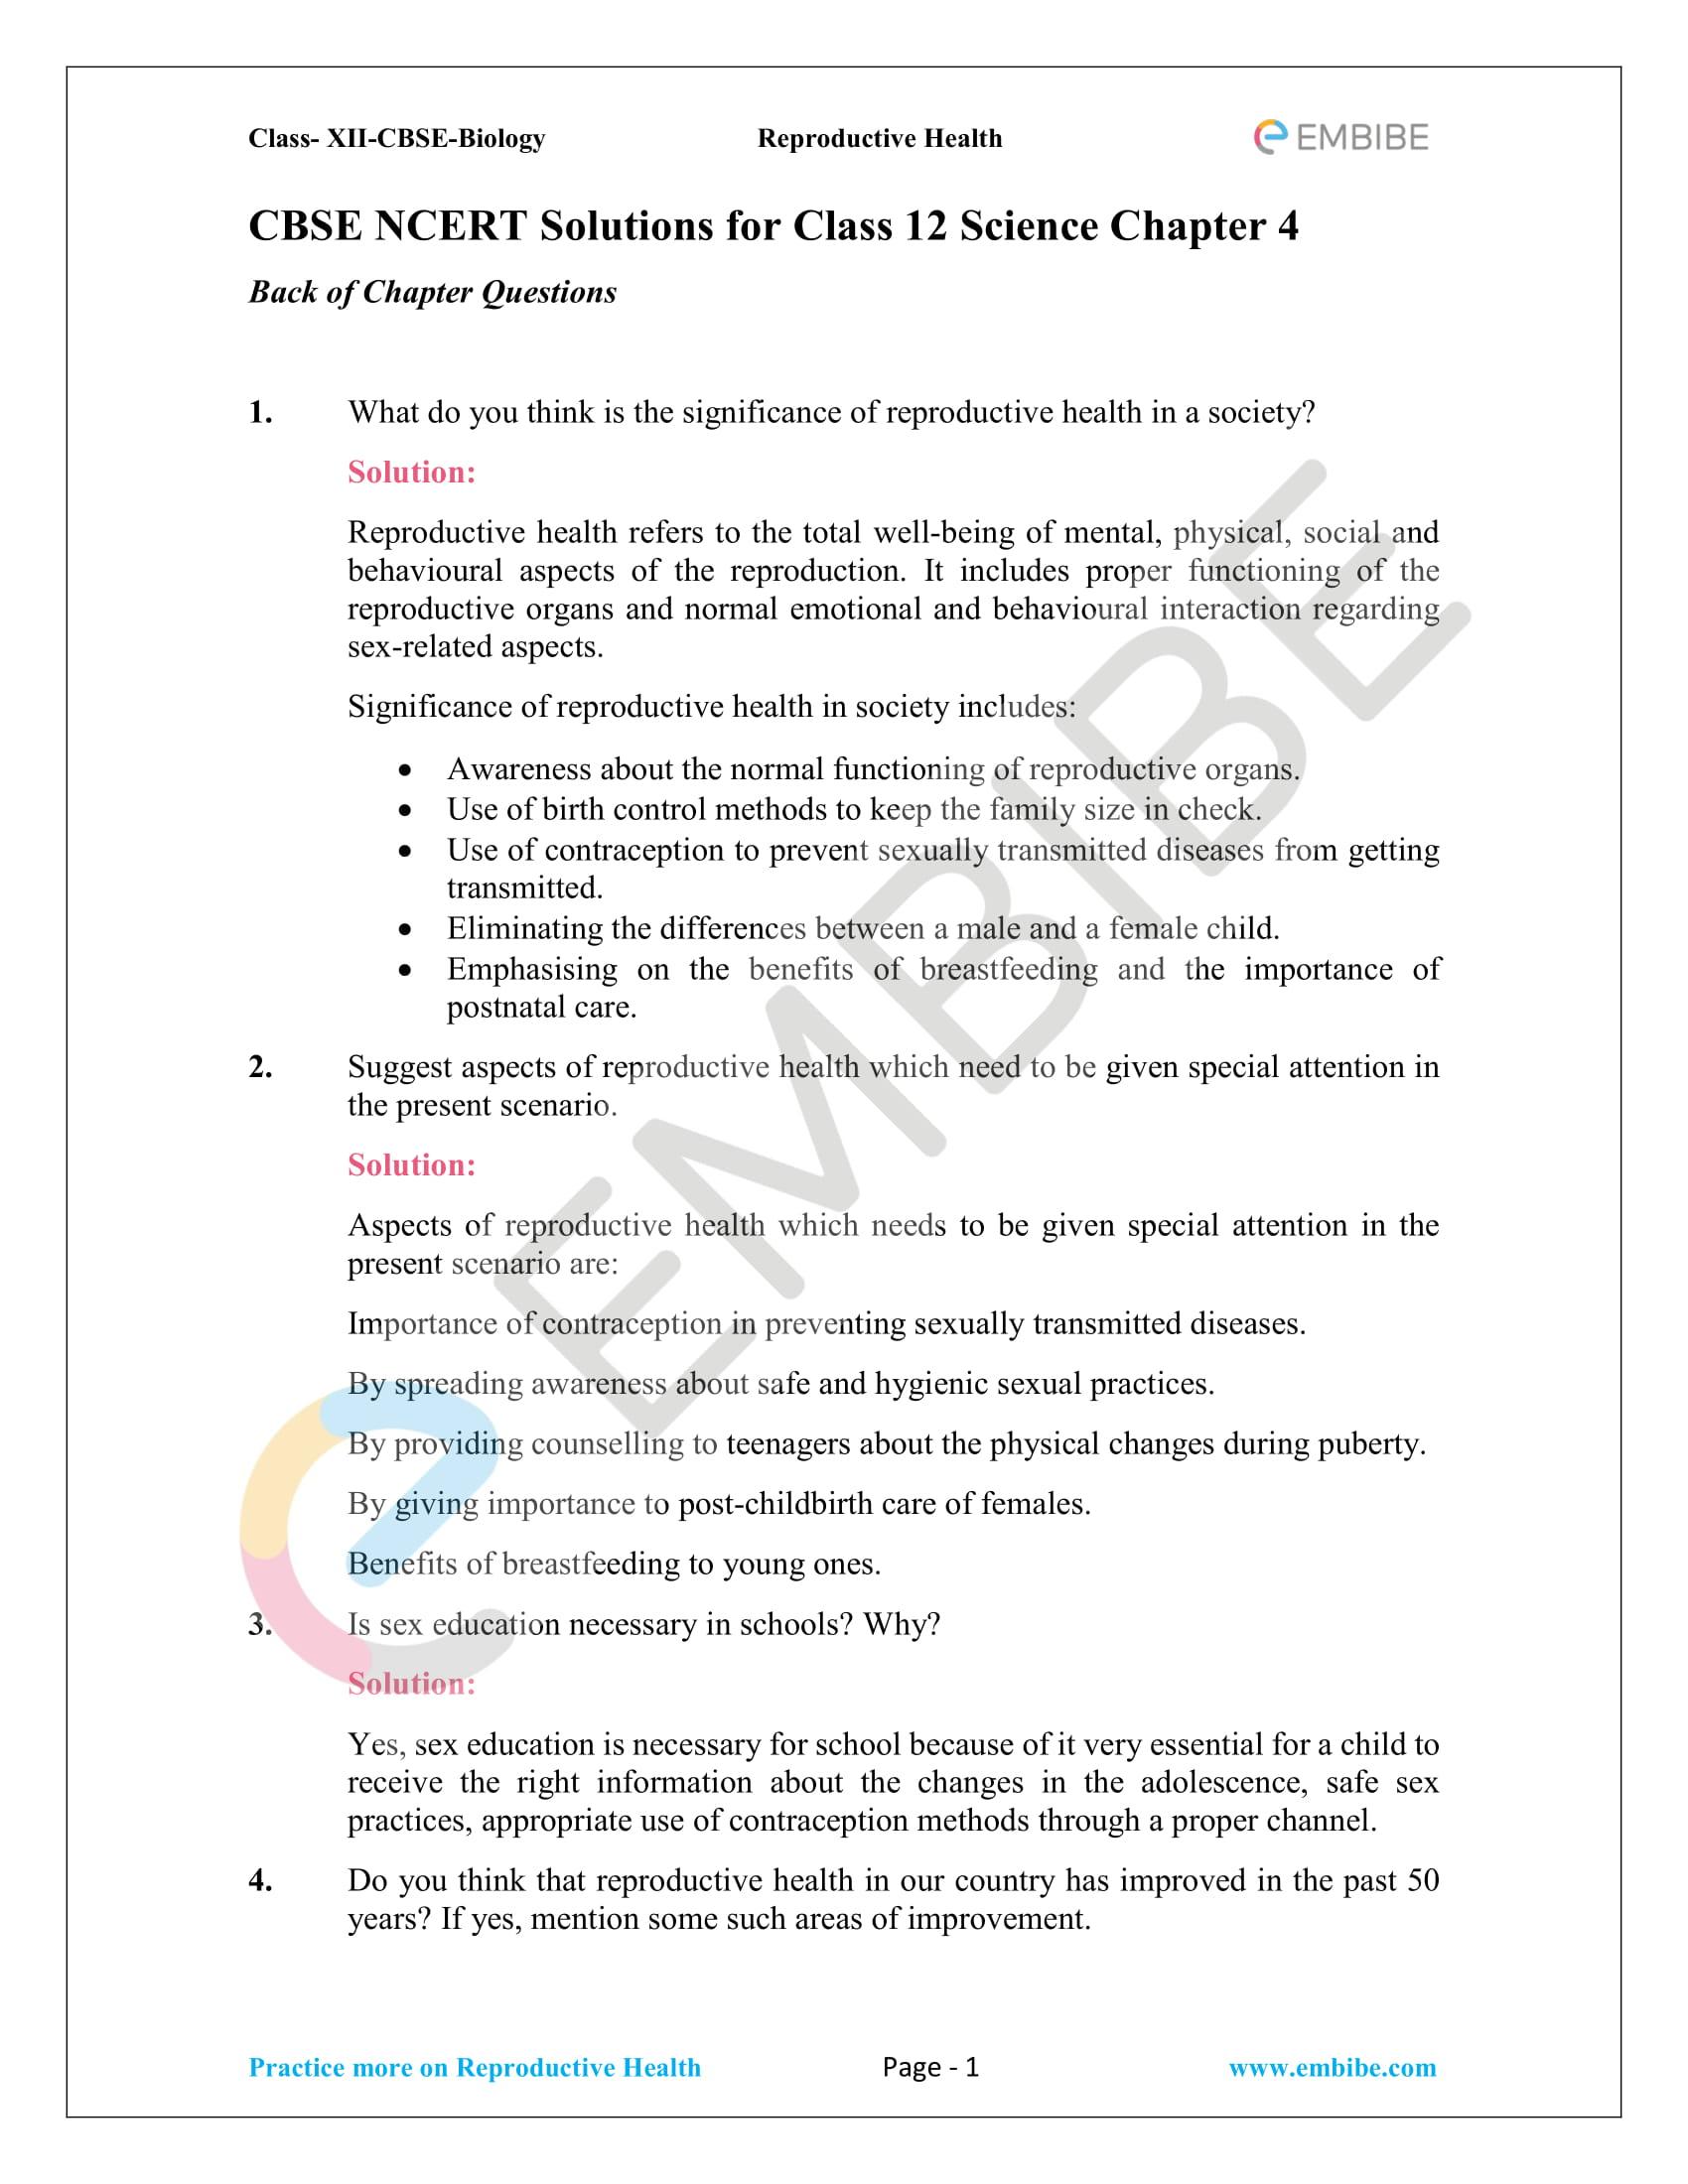 NCERT_Grade12_BOC_Biology_Reproductive Health-1